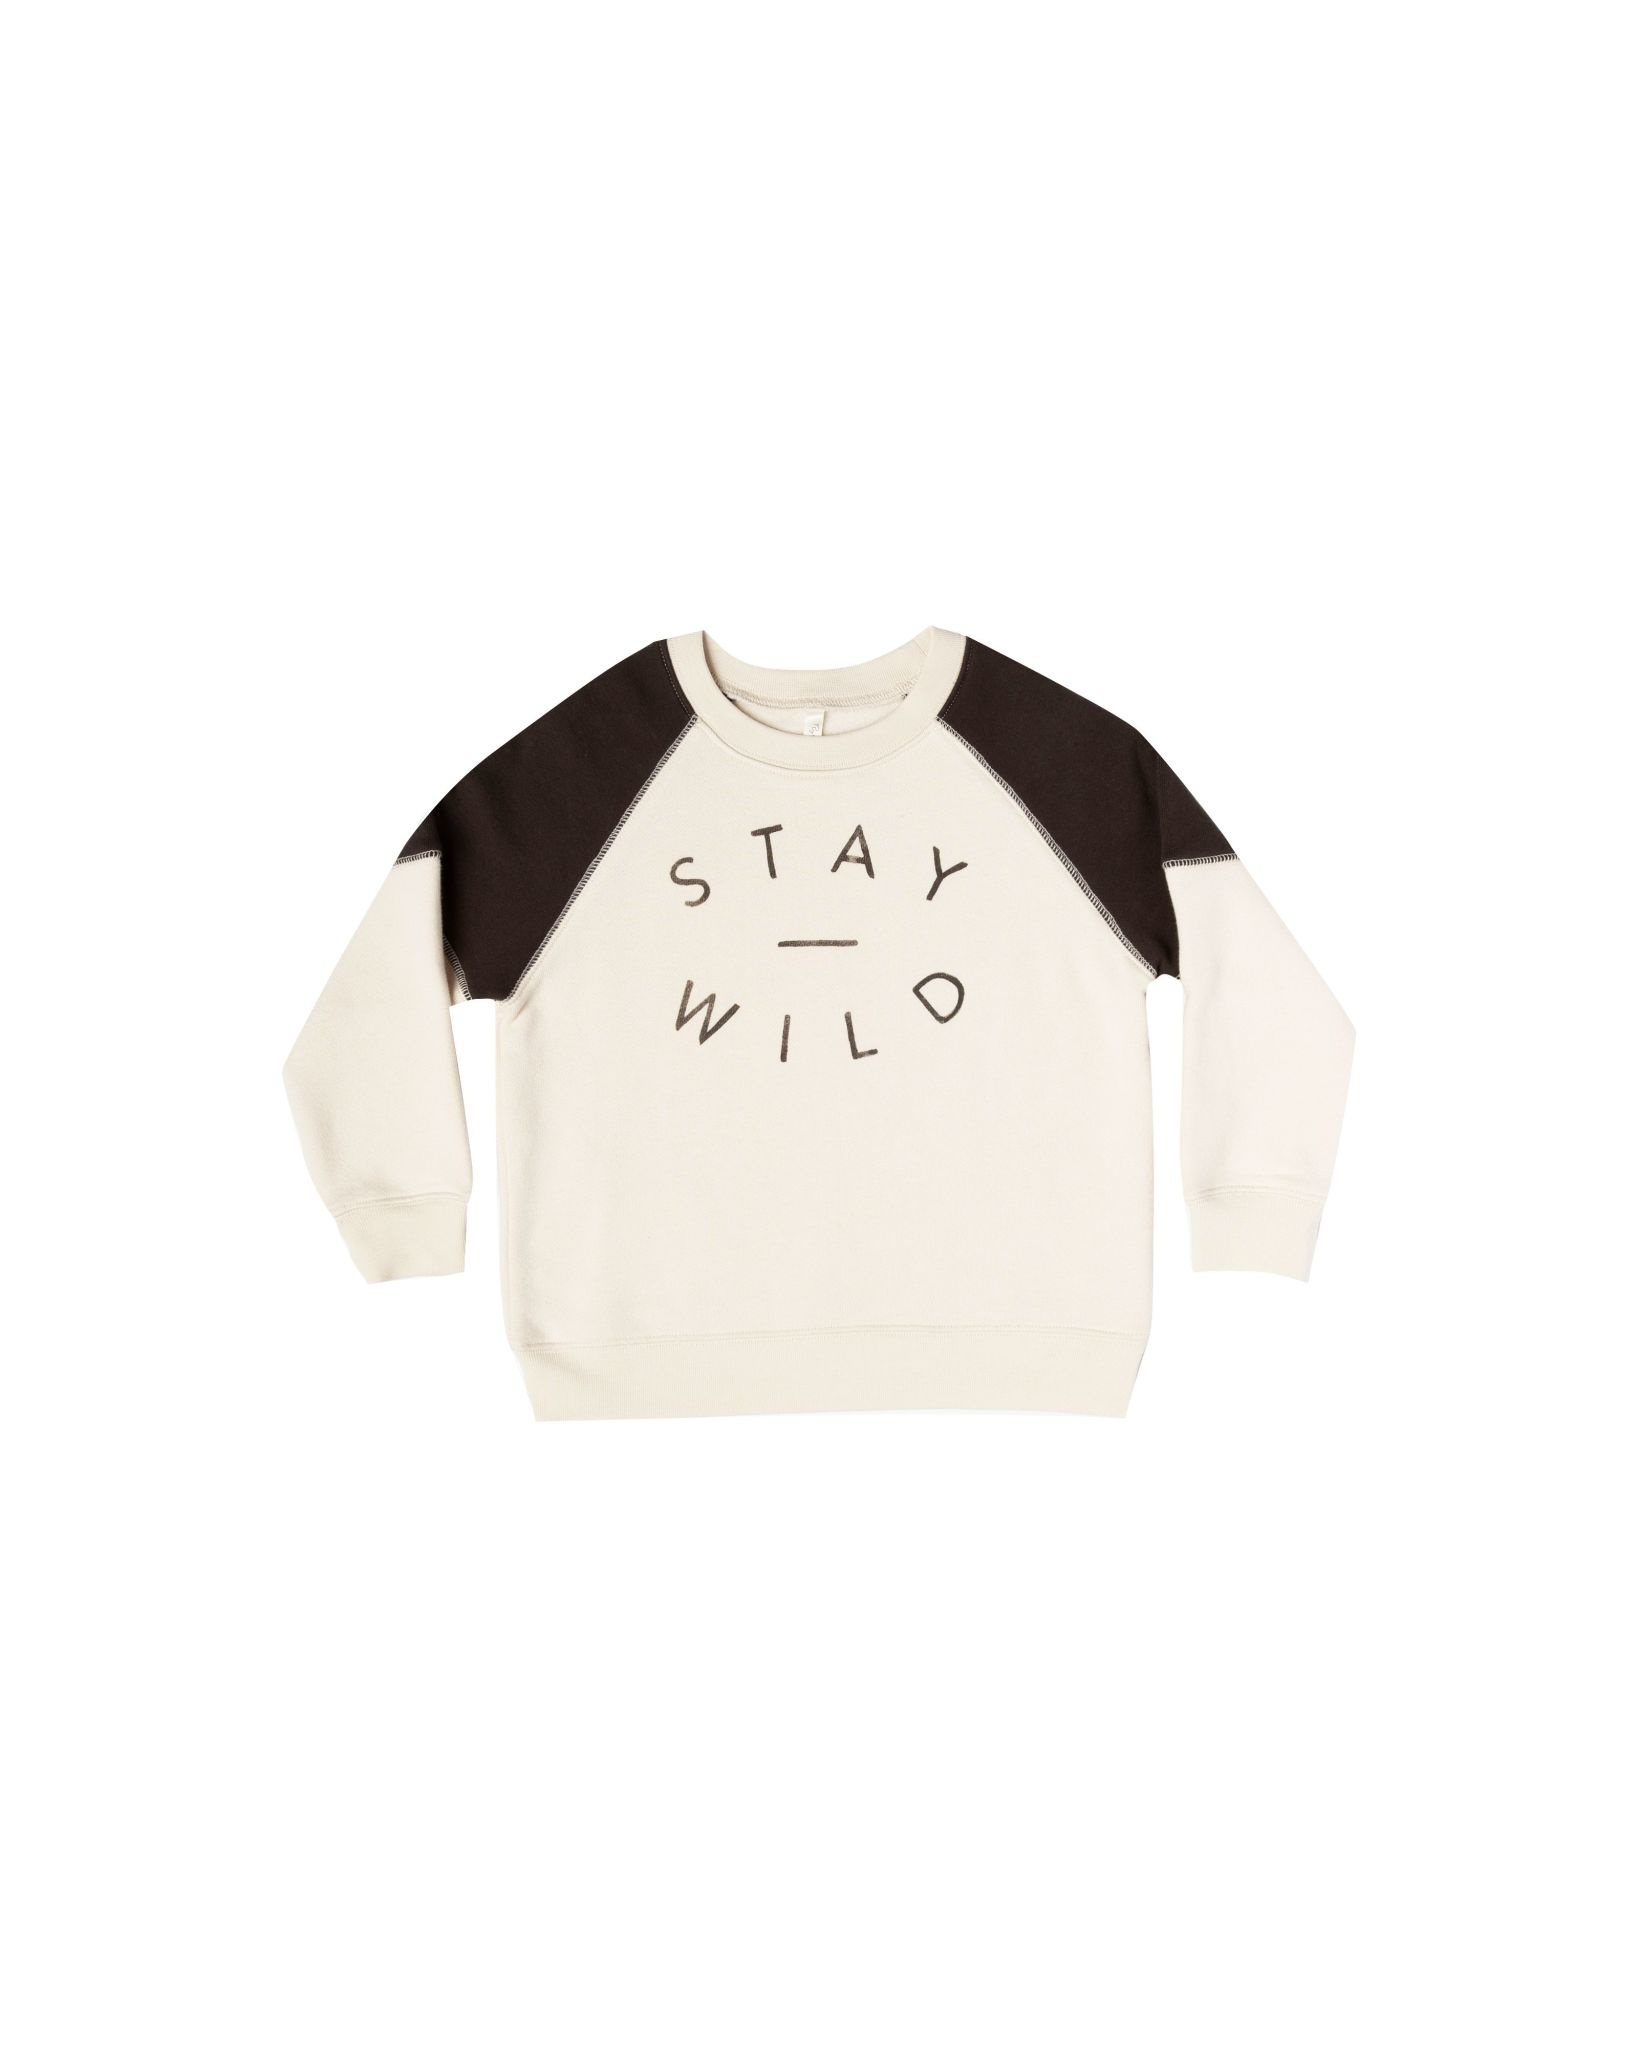 RYLEE AND CRU Stay Wild Raglan Sweatshirt